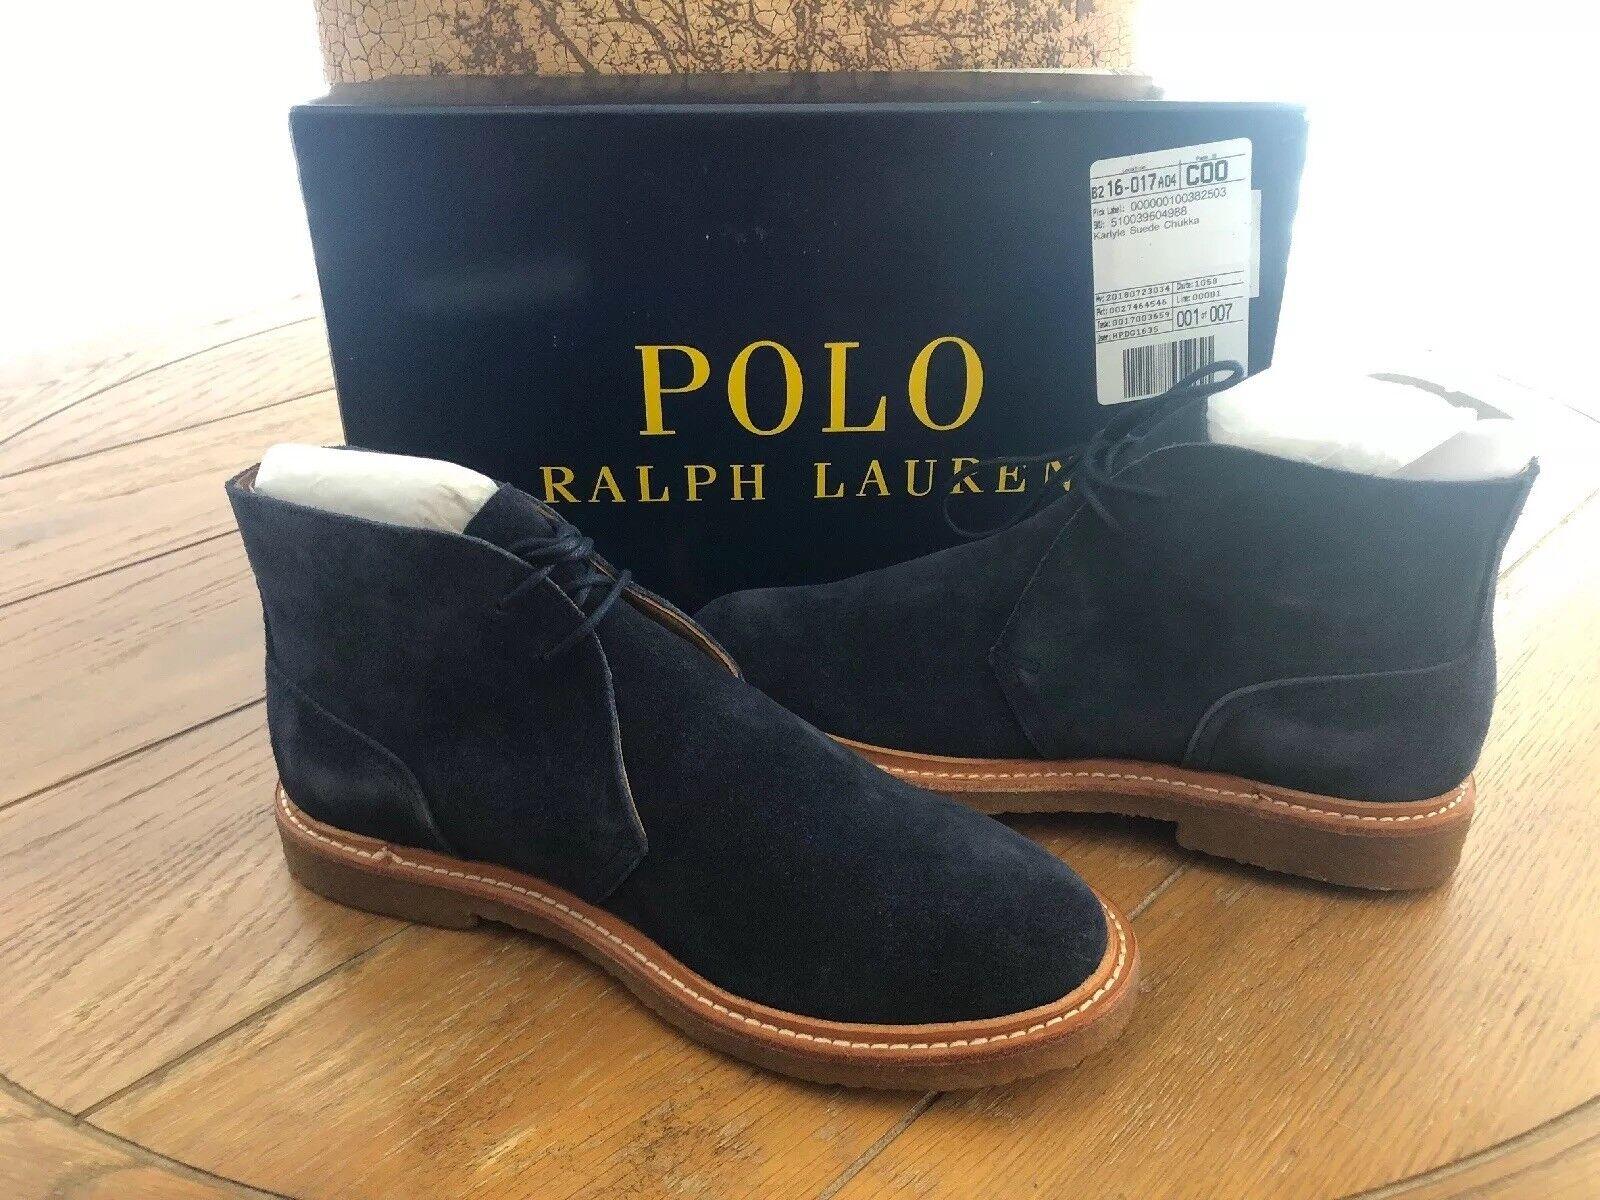 New Polo Ralph Lauren Mens FashionBoot Karyle size 7.5 color Navy